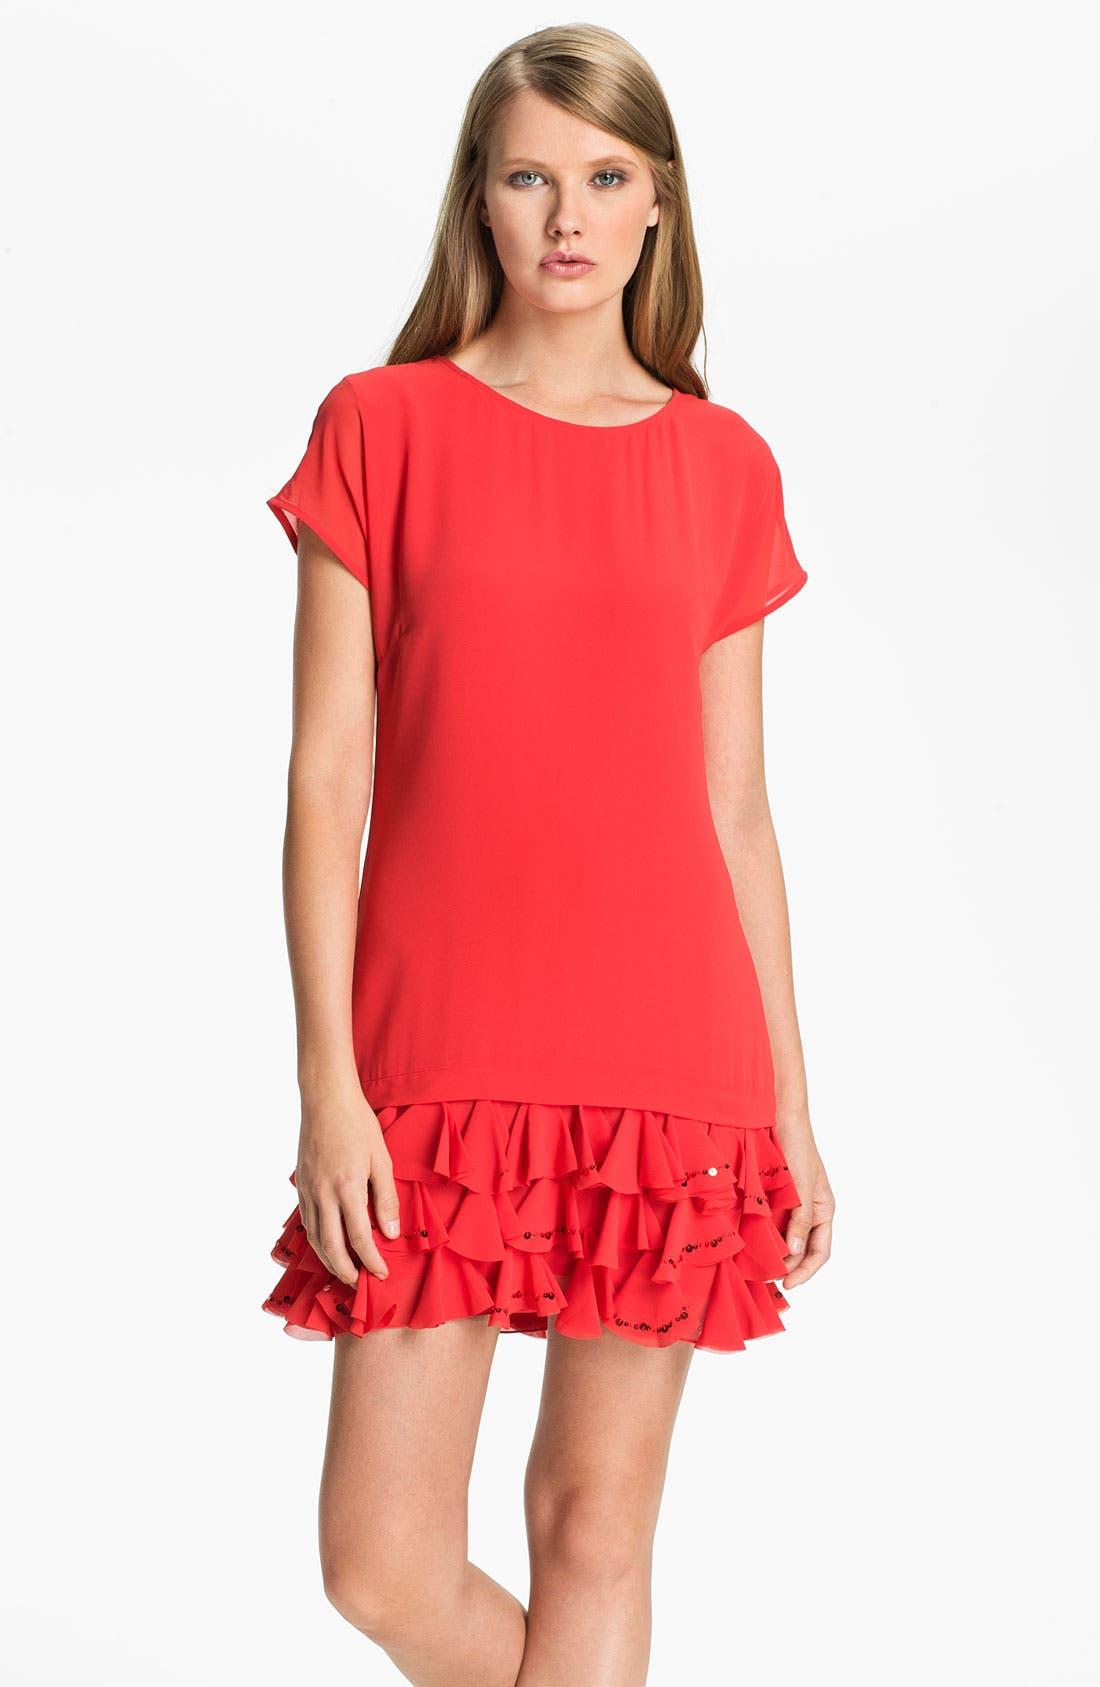 Main Image - Ted Baker London Ruffle Tunic Dress